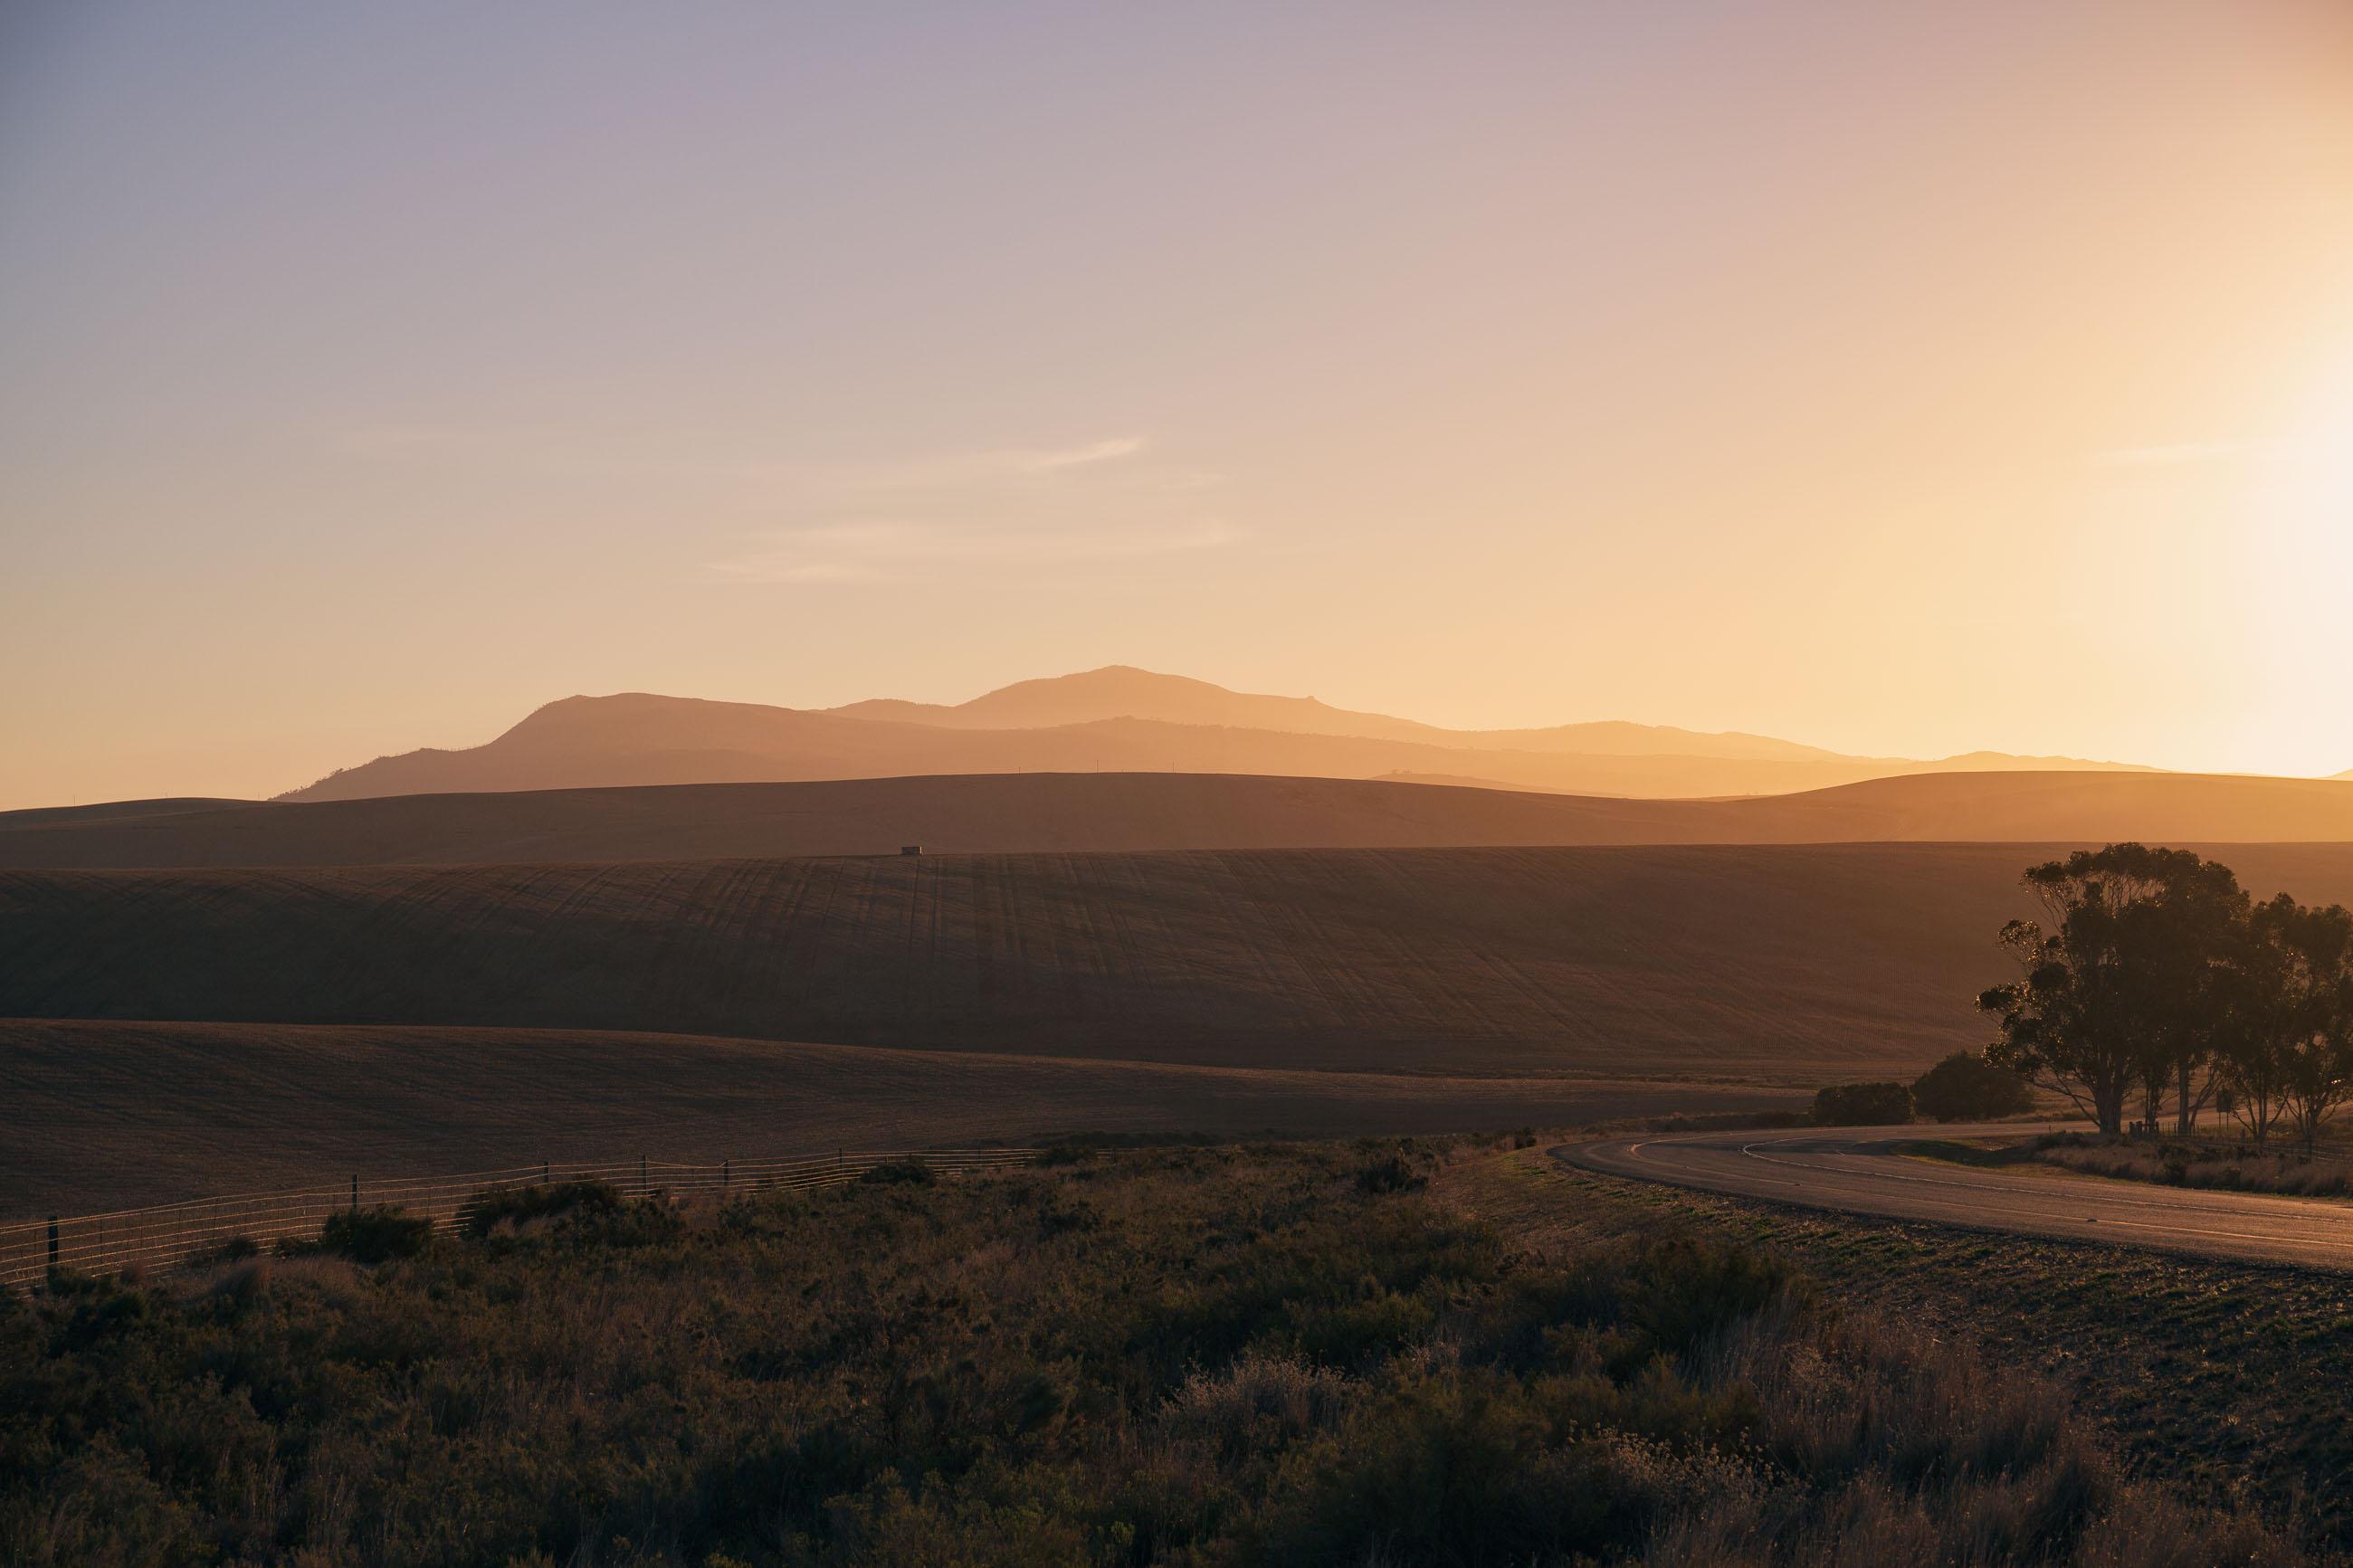 LANDSCHAFT IN SÜDAFRIKA FOTOGRAFIERT VOM KÖLNER FOTOGRAFEN SVEN VOGEL